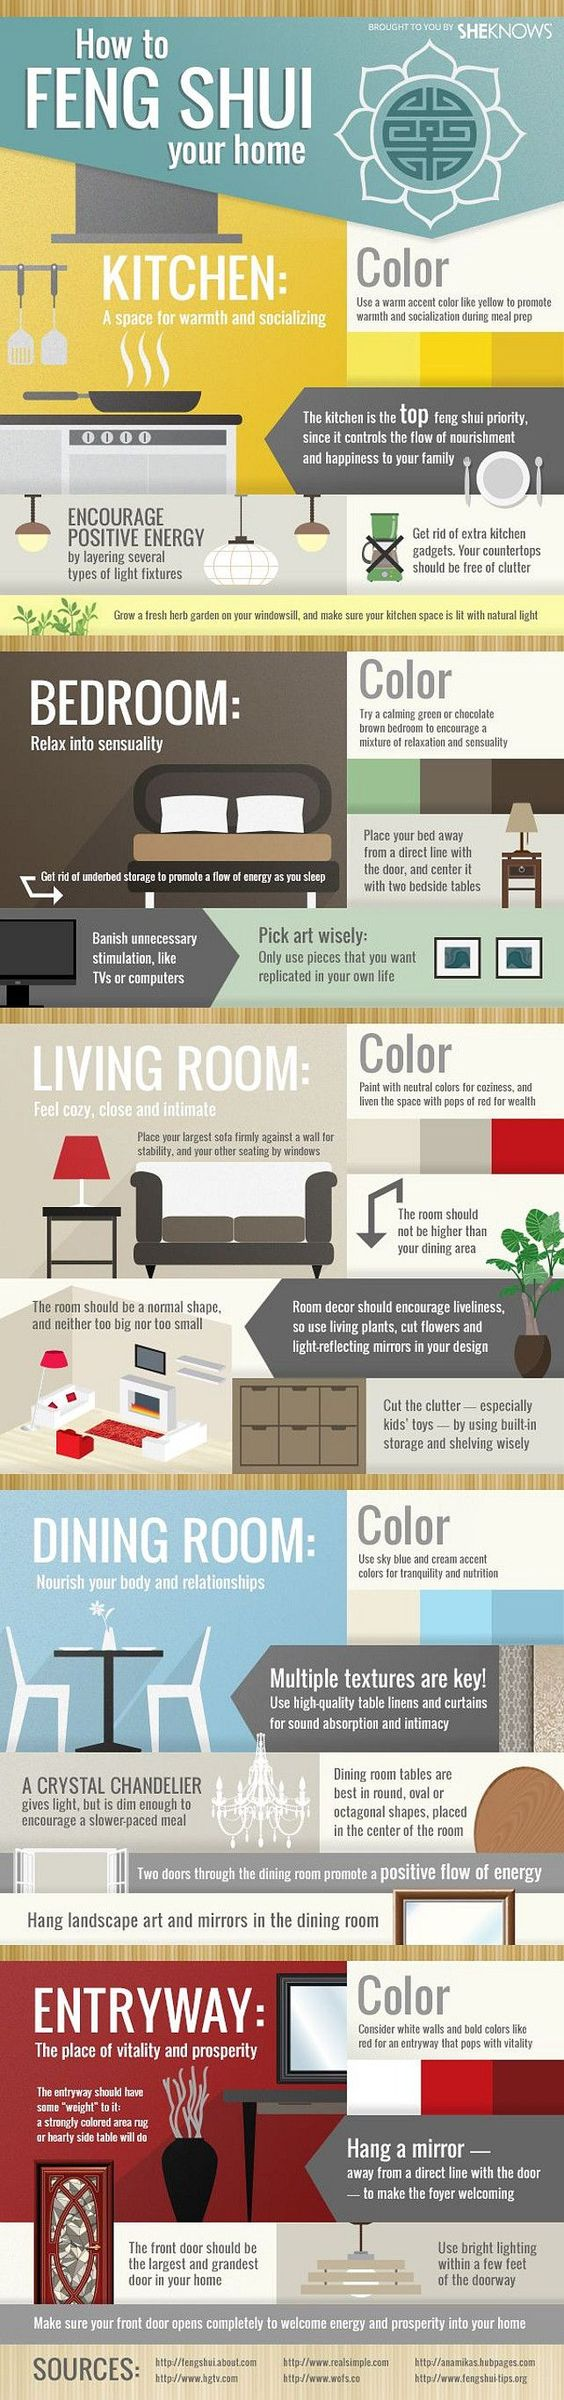 nice Interior design Ideas - Home Bunch - An Interior Design & Luxury Homes Blog by http://www.homedecorbydana.xyz/home-decor-colors/interior-design-ideas-home-bunch-an-interior-design-luxury-homes-blog-2/